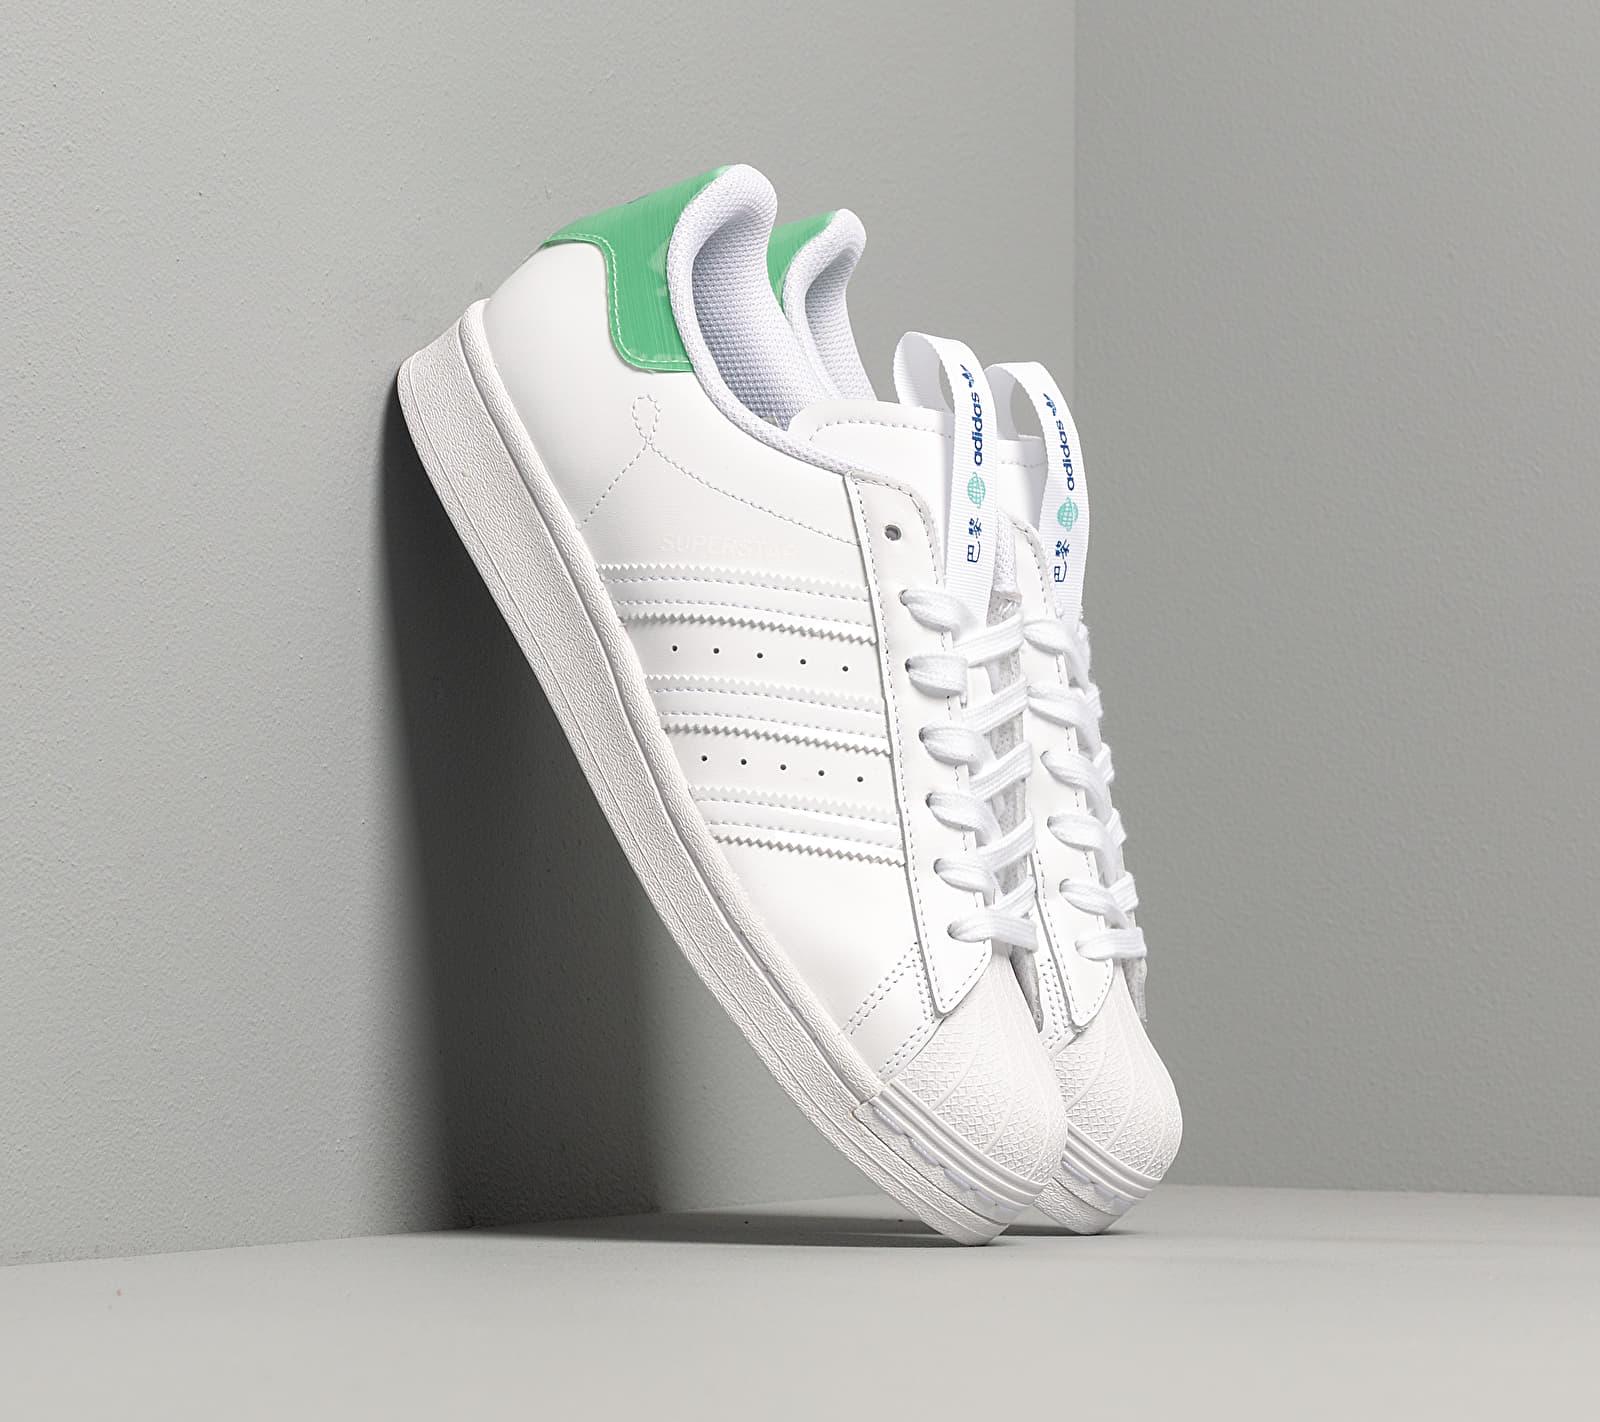 adidas Superstar Ftwr White/ Prism Mint/ Collegiate Royal EUR 39 1/3